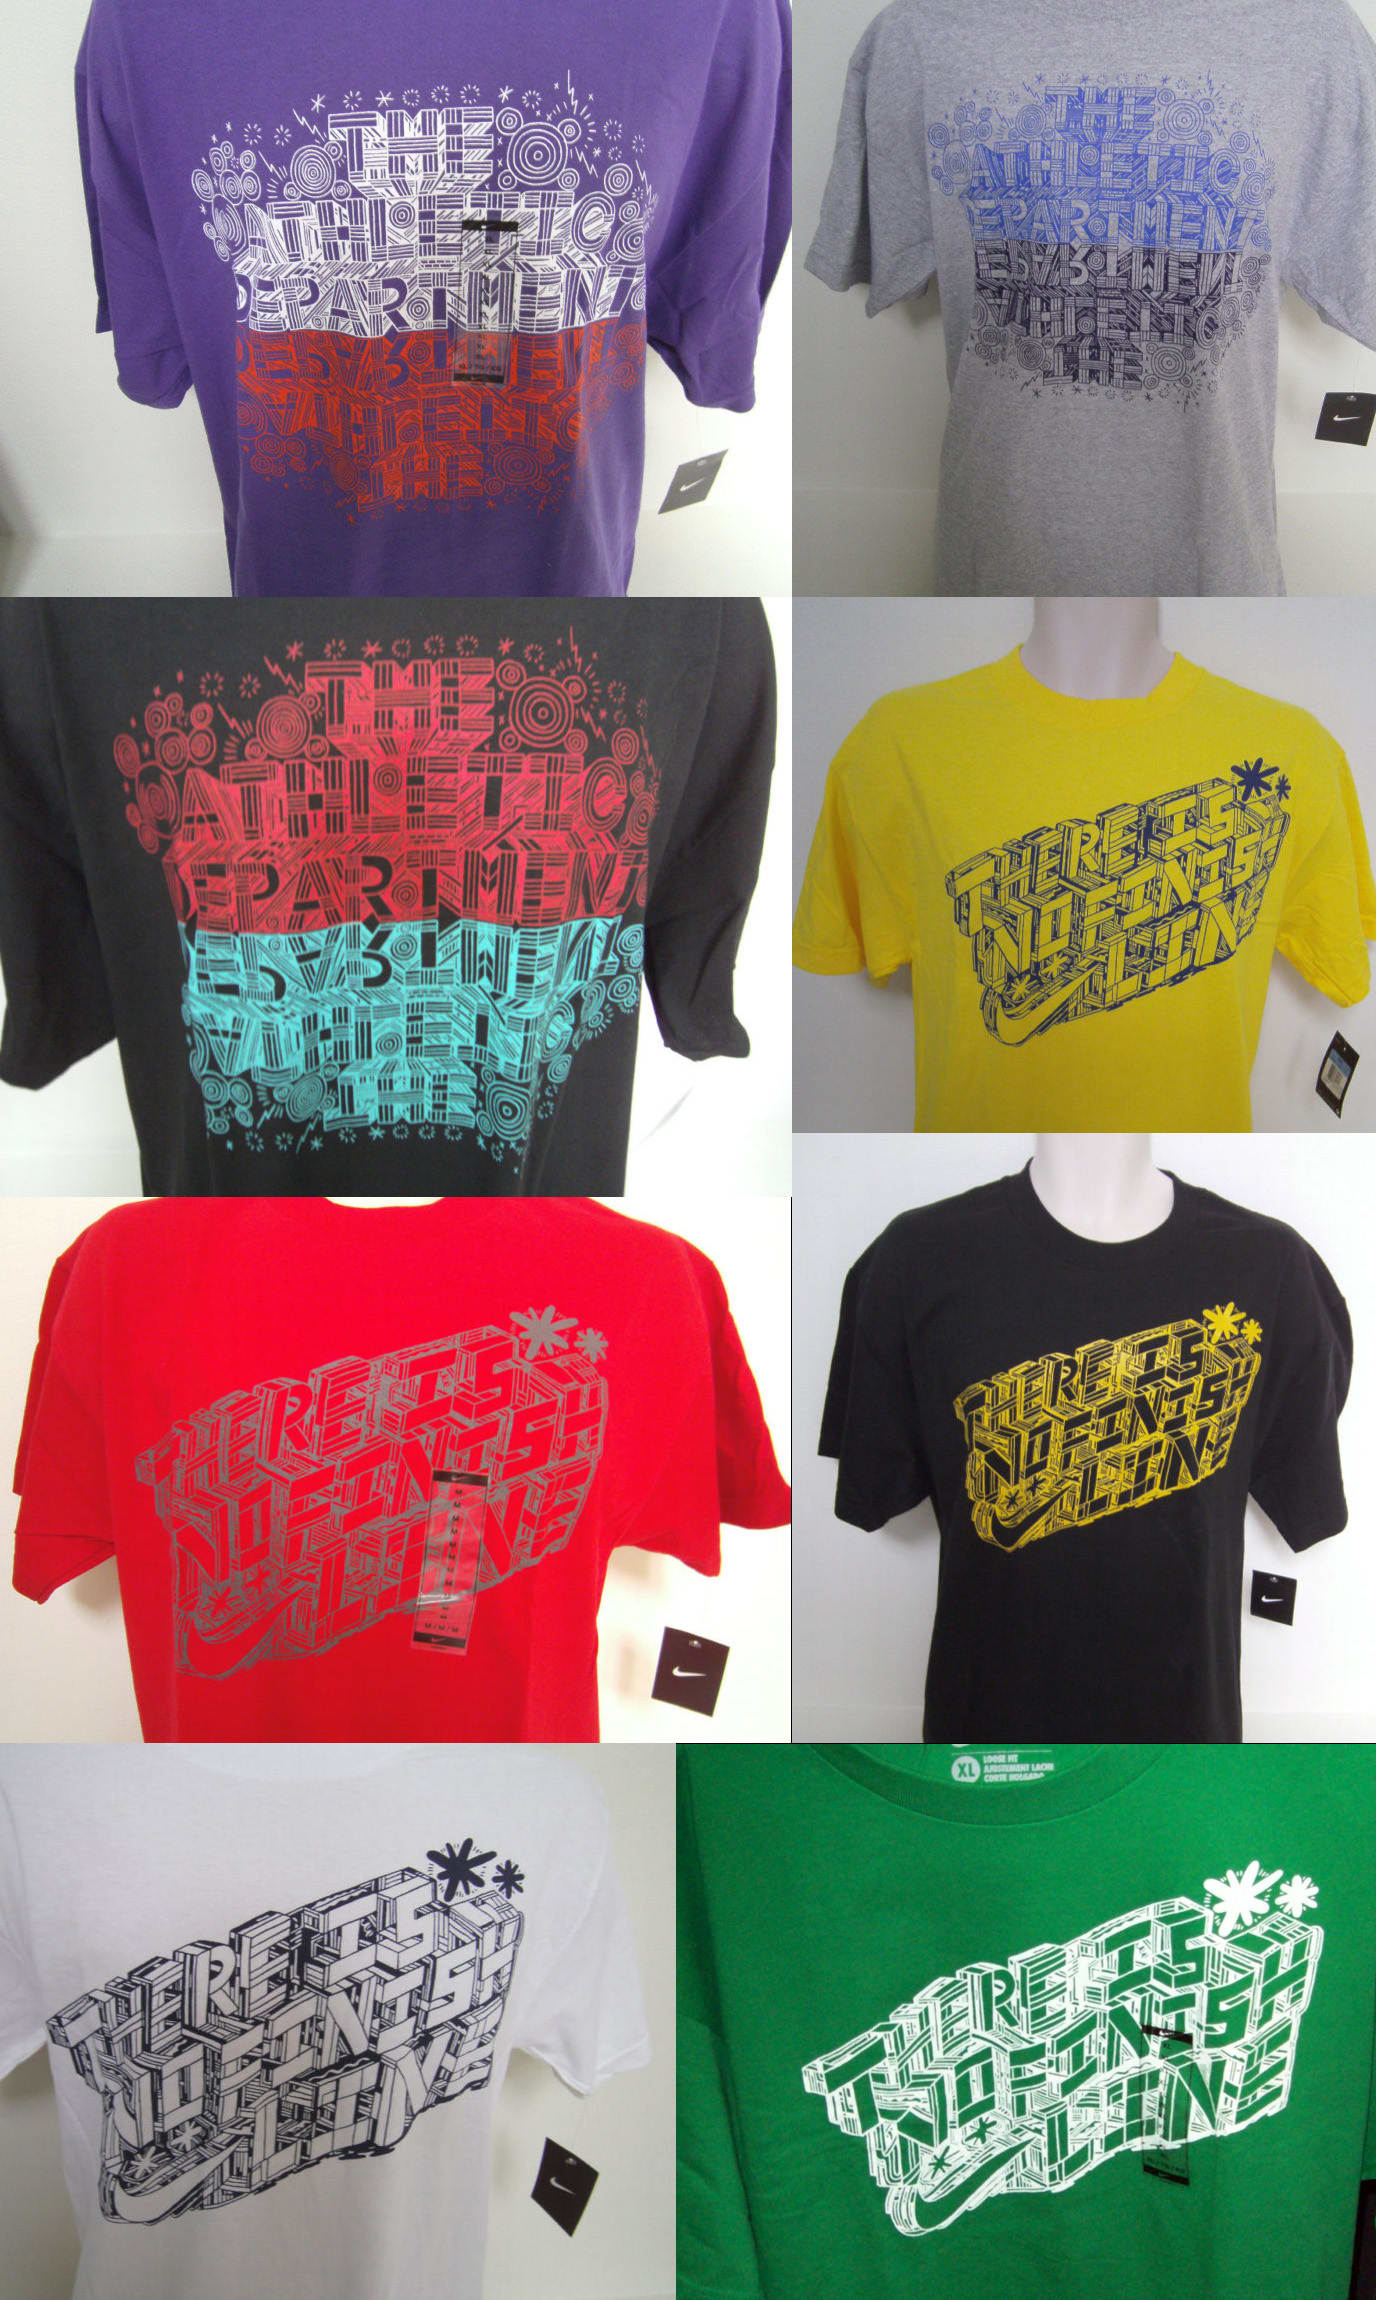 Nike Shirt designs